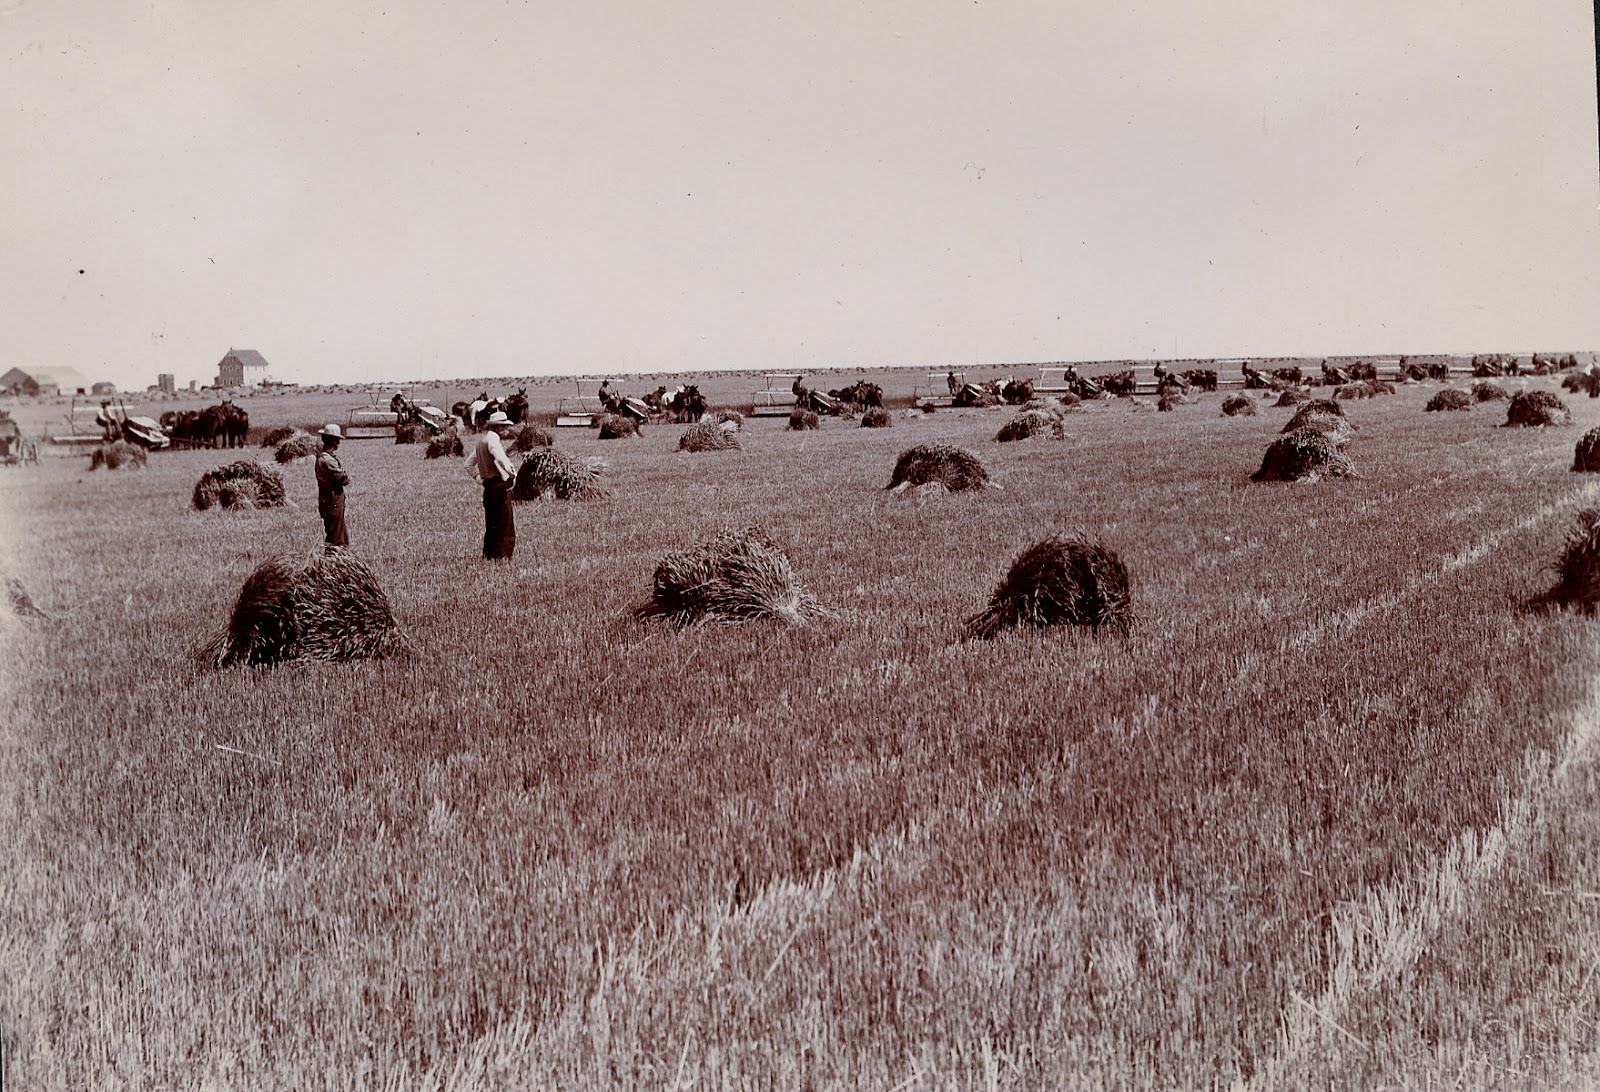 Early farming 1910 threshing near Lethbridge   Courtesy the Galt Museum & Archives: 19740030000-025 p 65